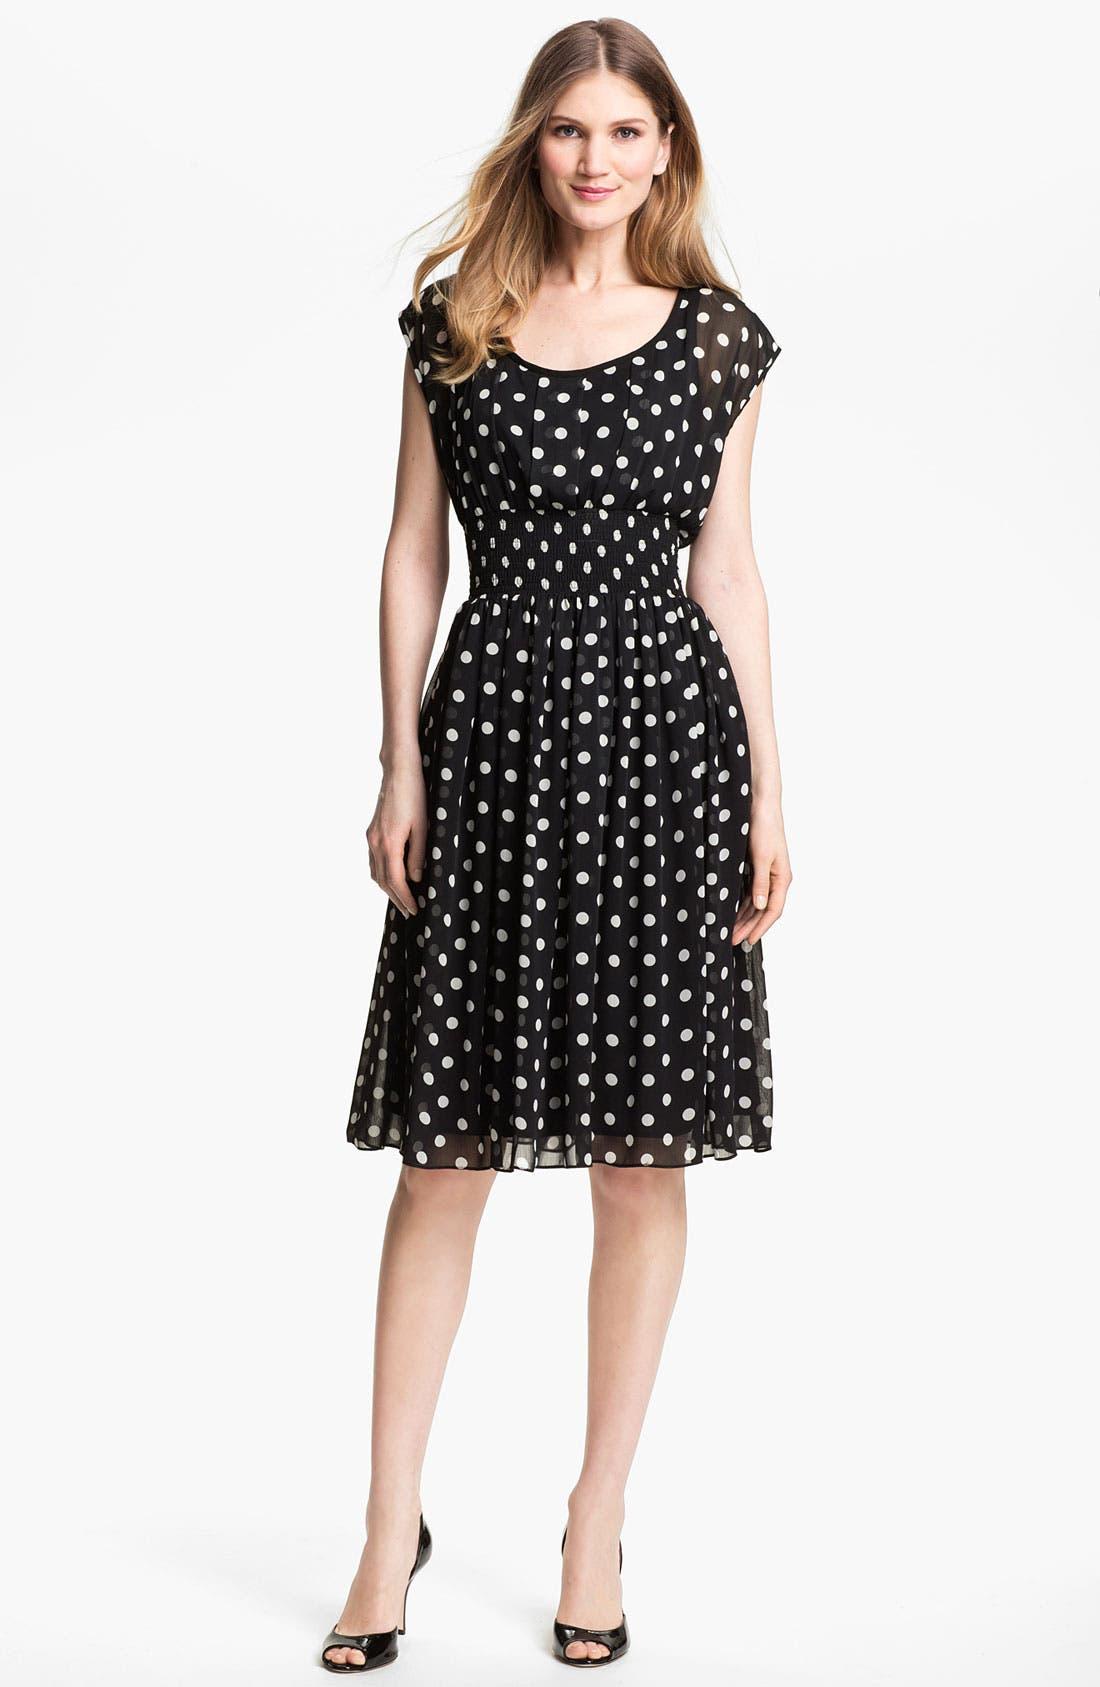 Main Image - Isaac Mizrahi New York Polka Dot Chiffon Dress